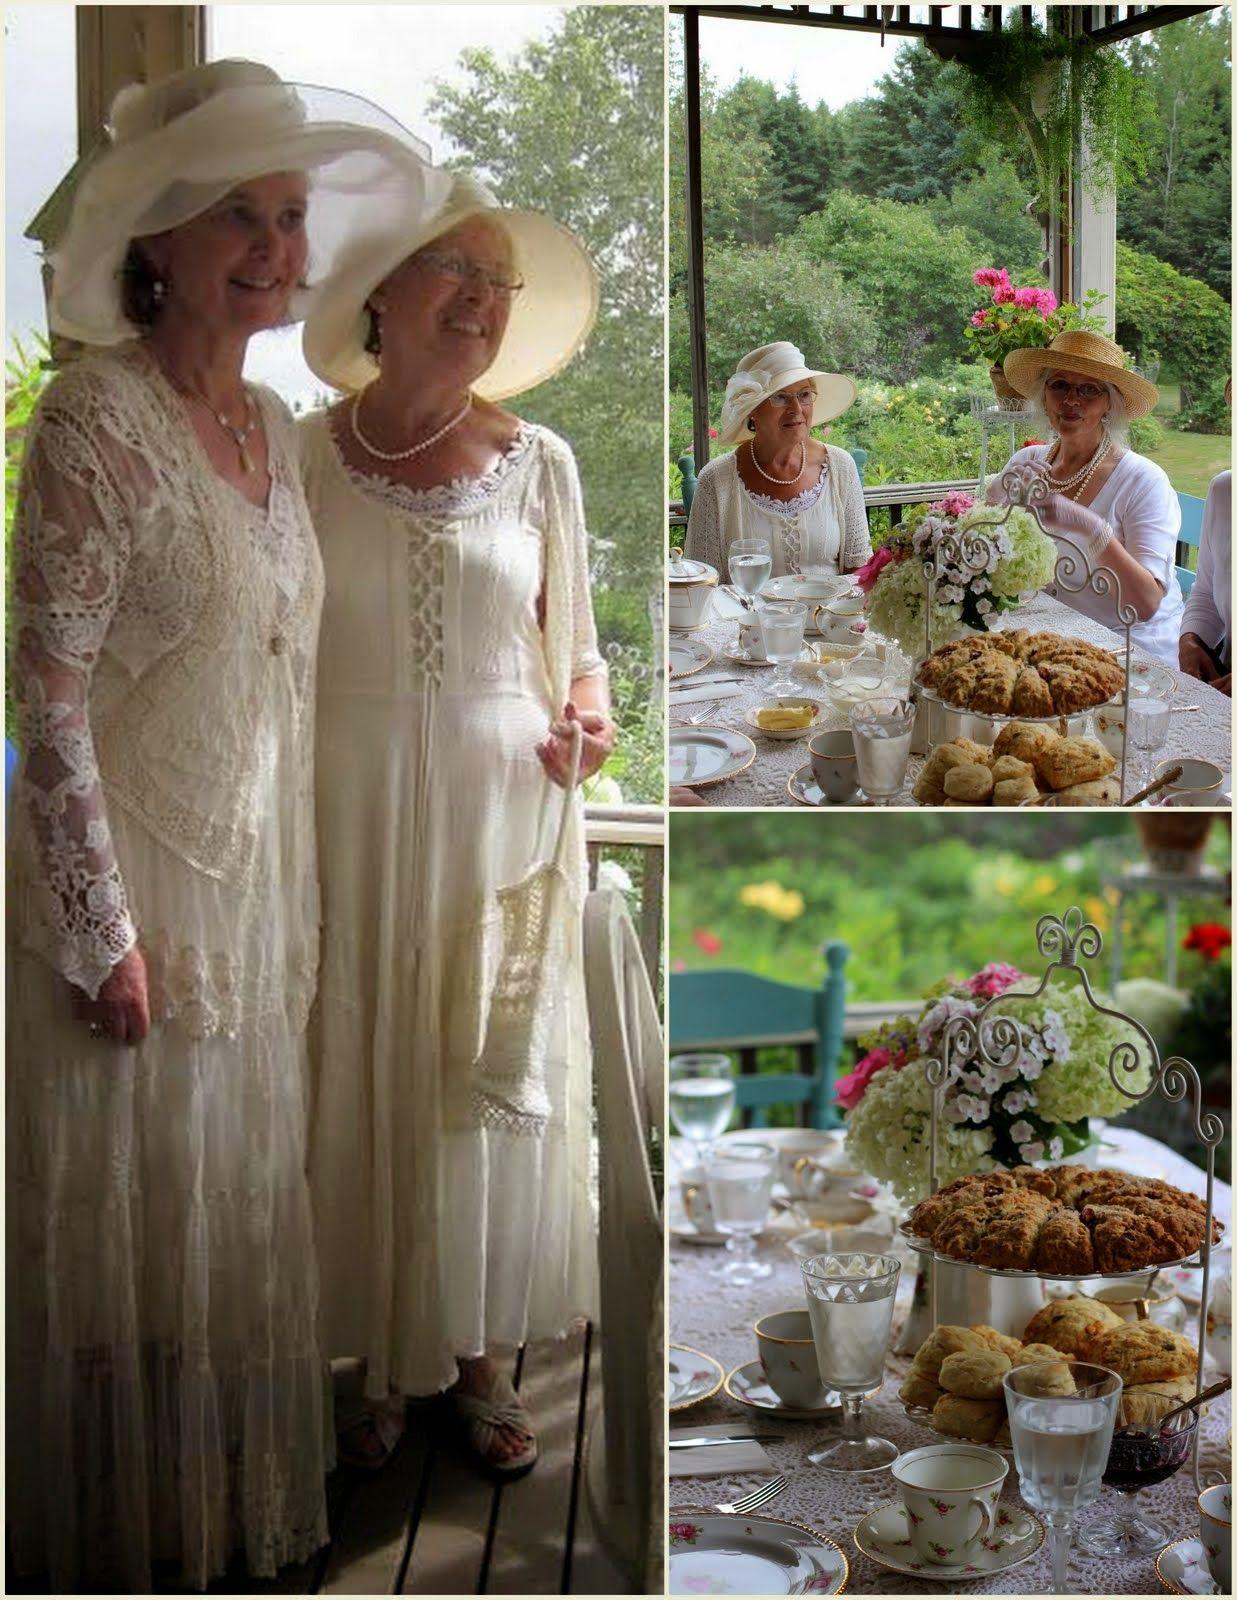 Aiken House Gardens Summer Garden Tea Victorian Tea Party Outdoor Tea Parties English Tea Party [ 1600 x 1237 Pixel ]